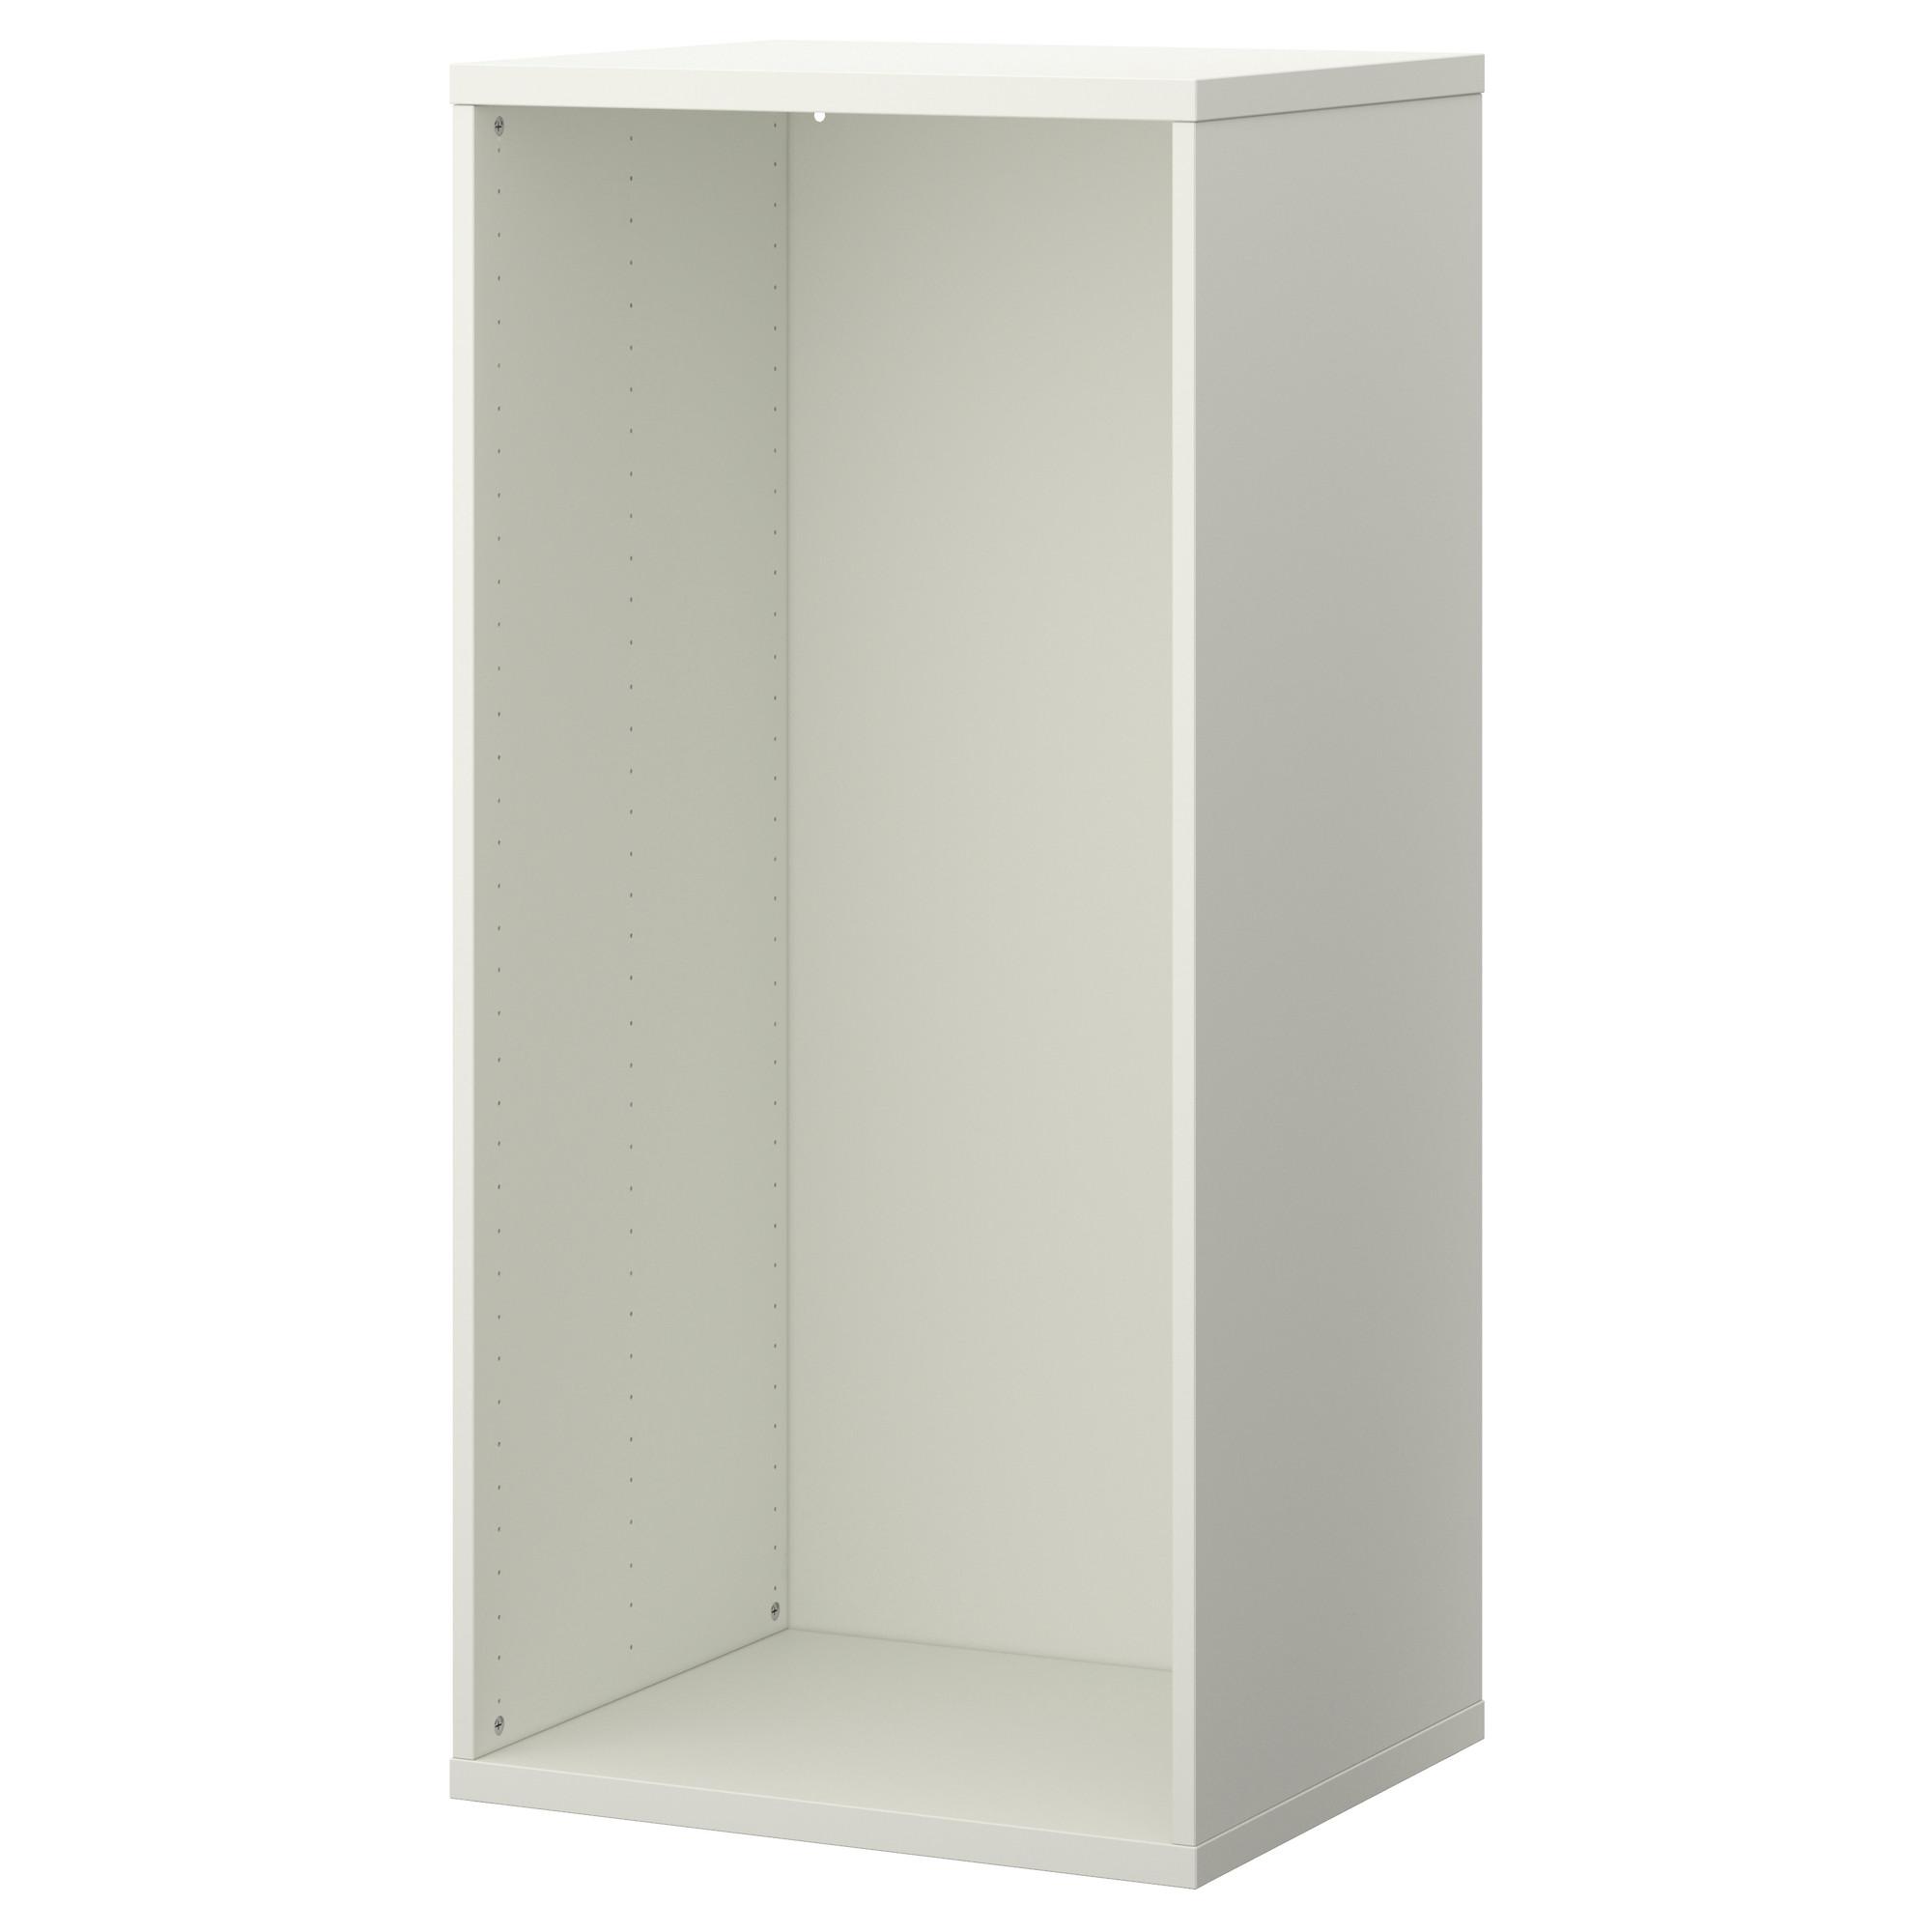 stuva basiselement wit american girl ideas pinterest ikea ikea stuva and shelves. Black Bedroom Furniture Sets. Home Design Ideas